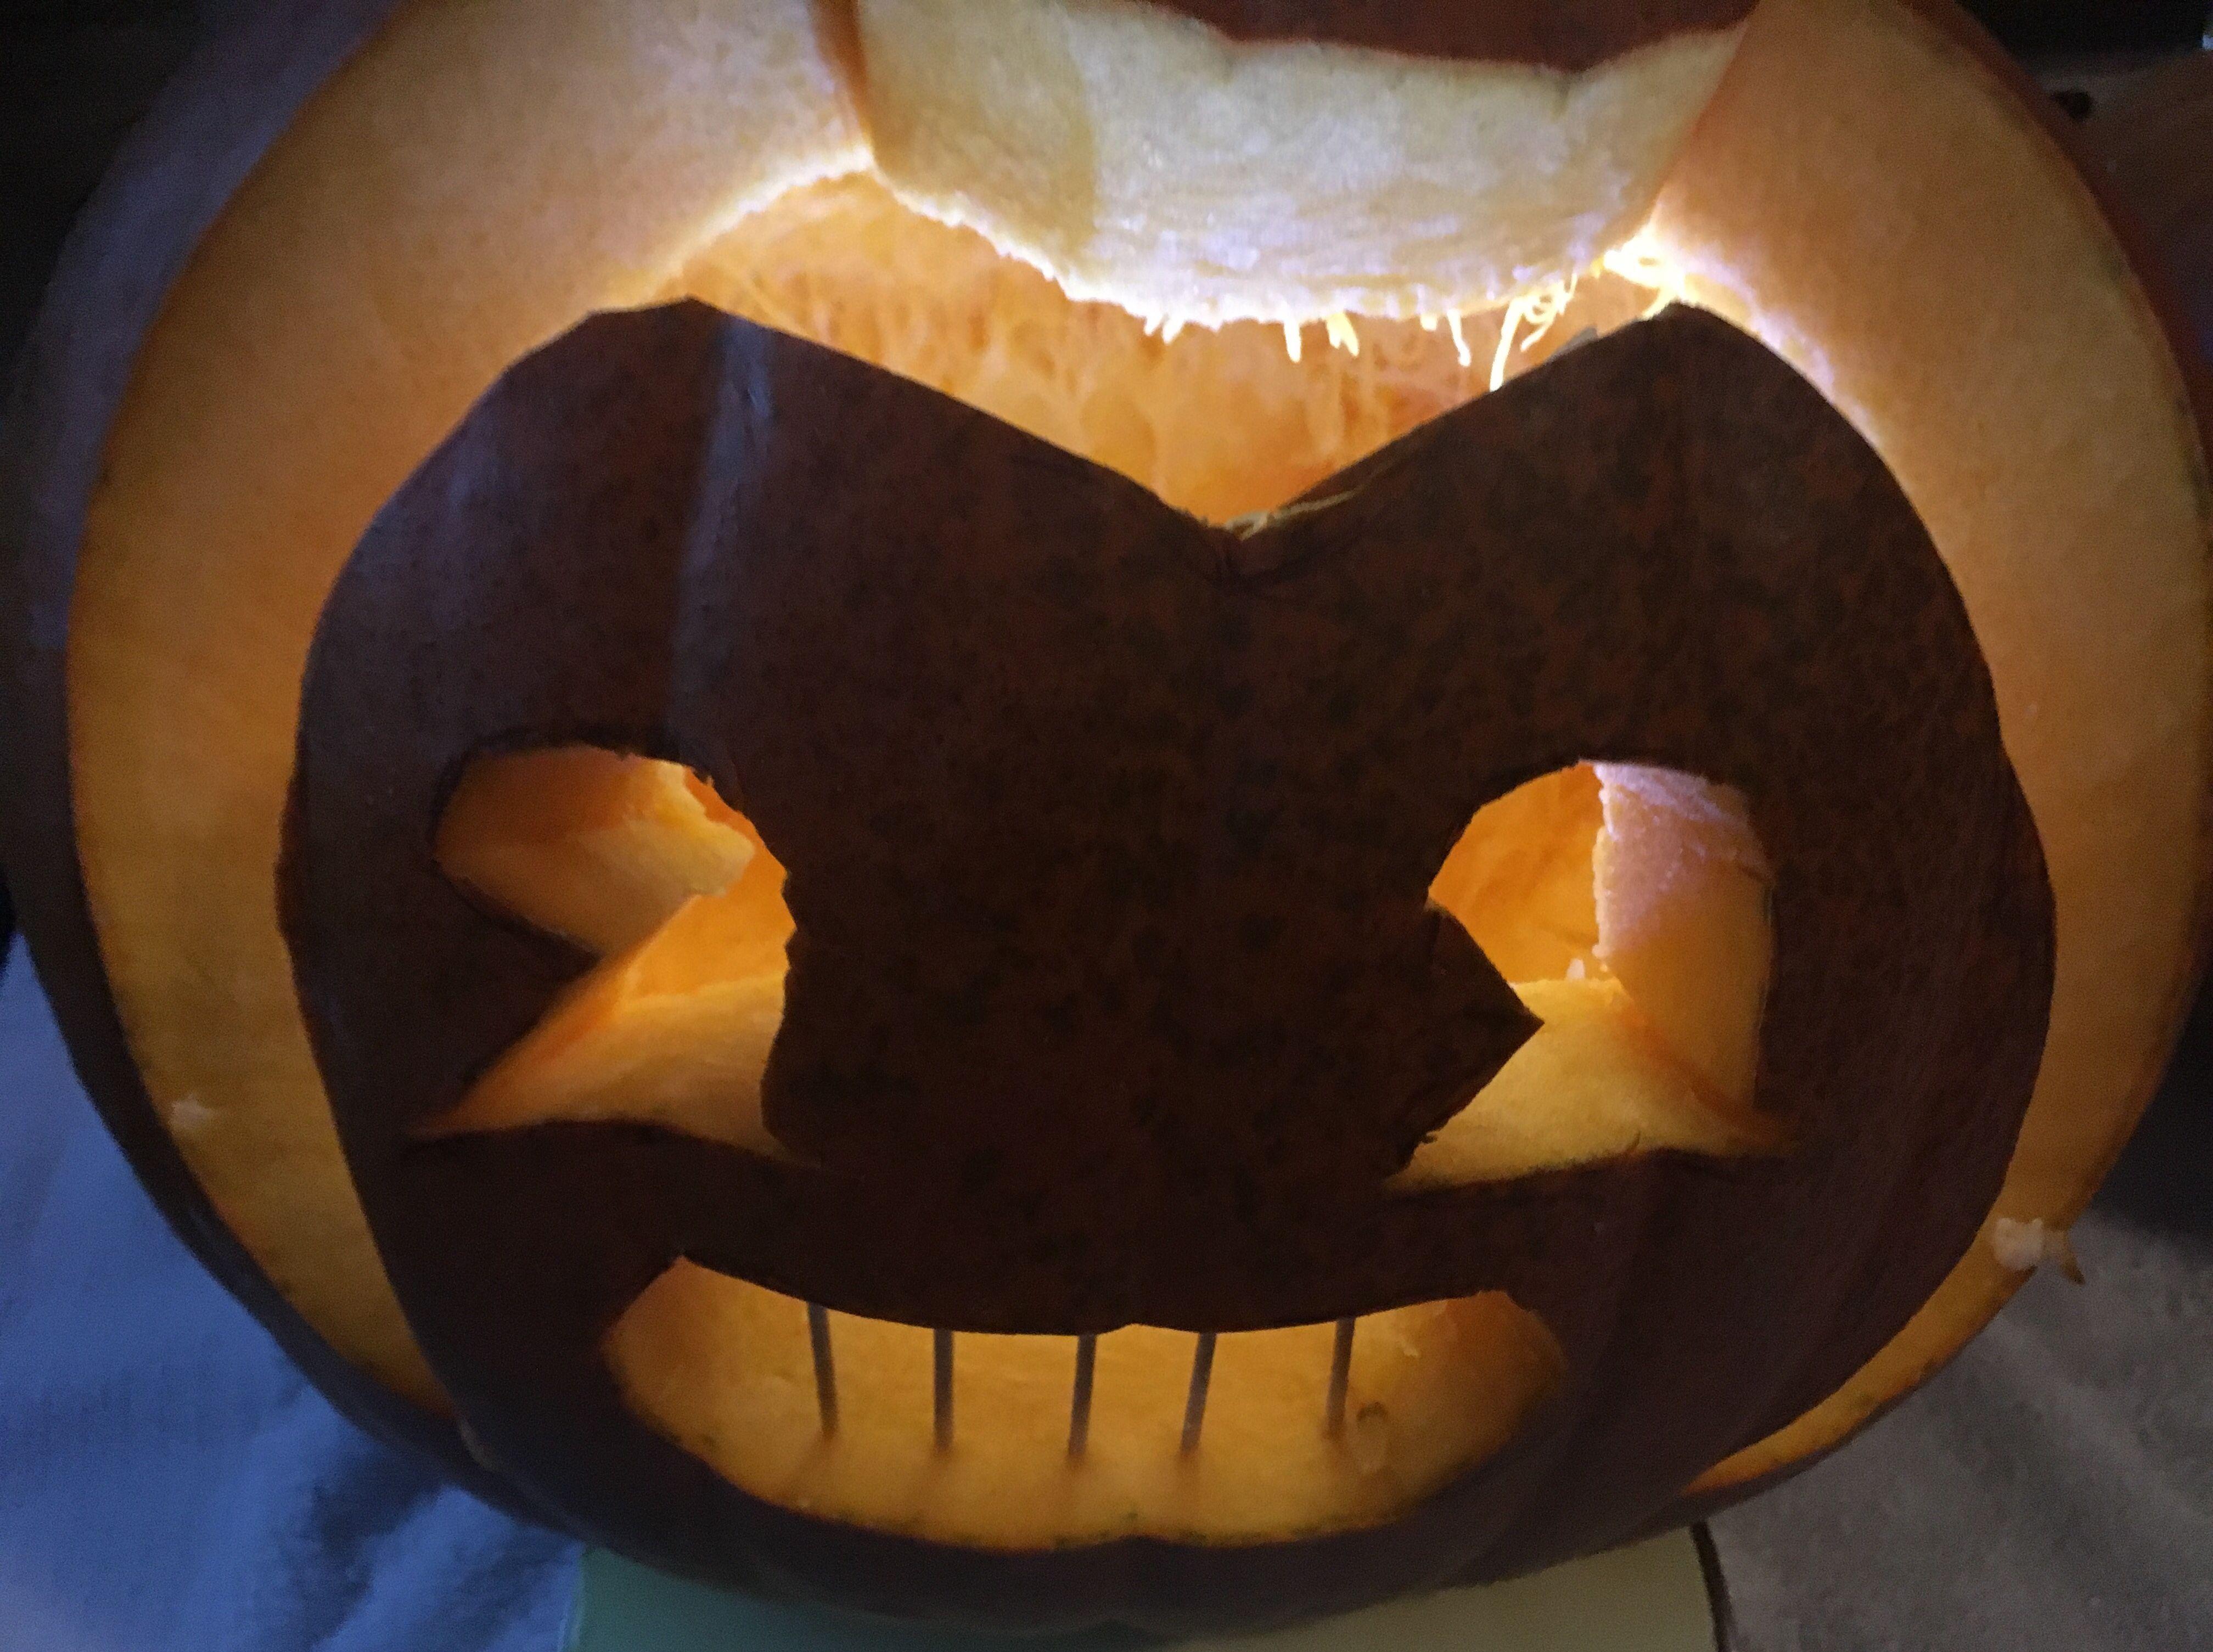 Pumpkin Carving Bendy Pumpkin Carving Crafts For Kids Halloween Fun